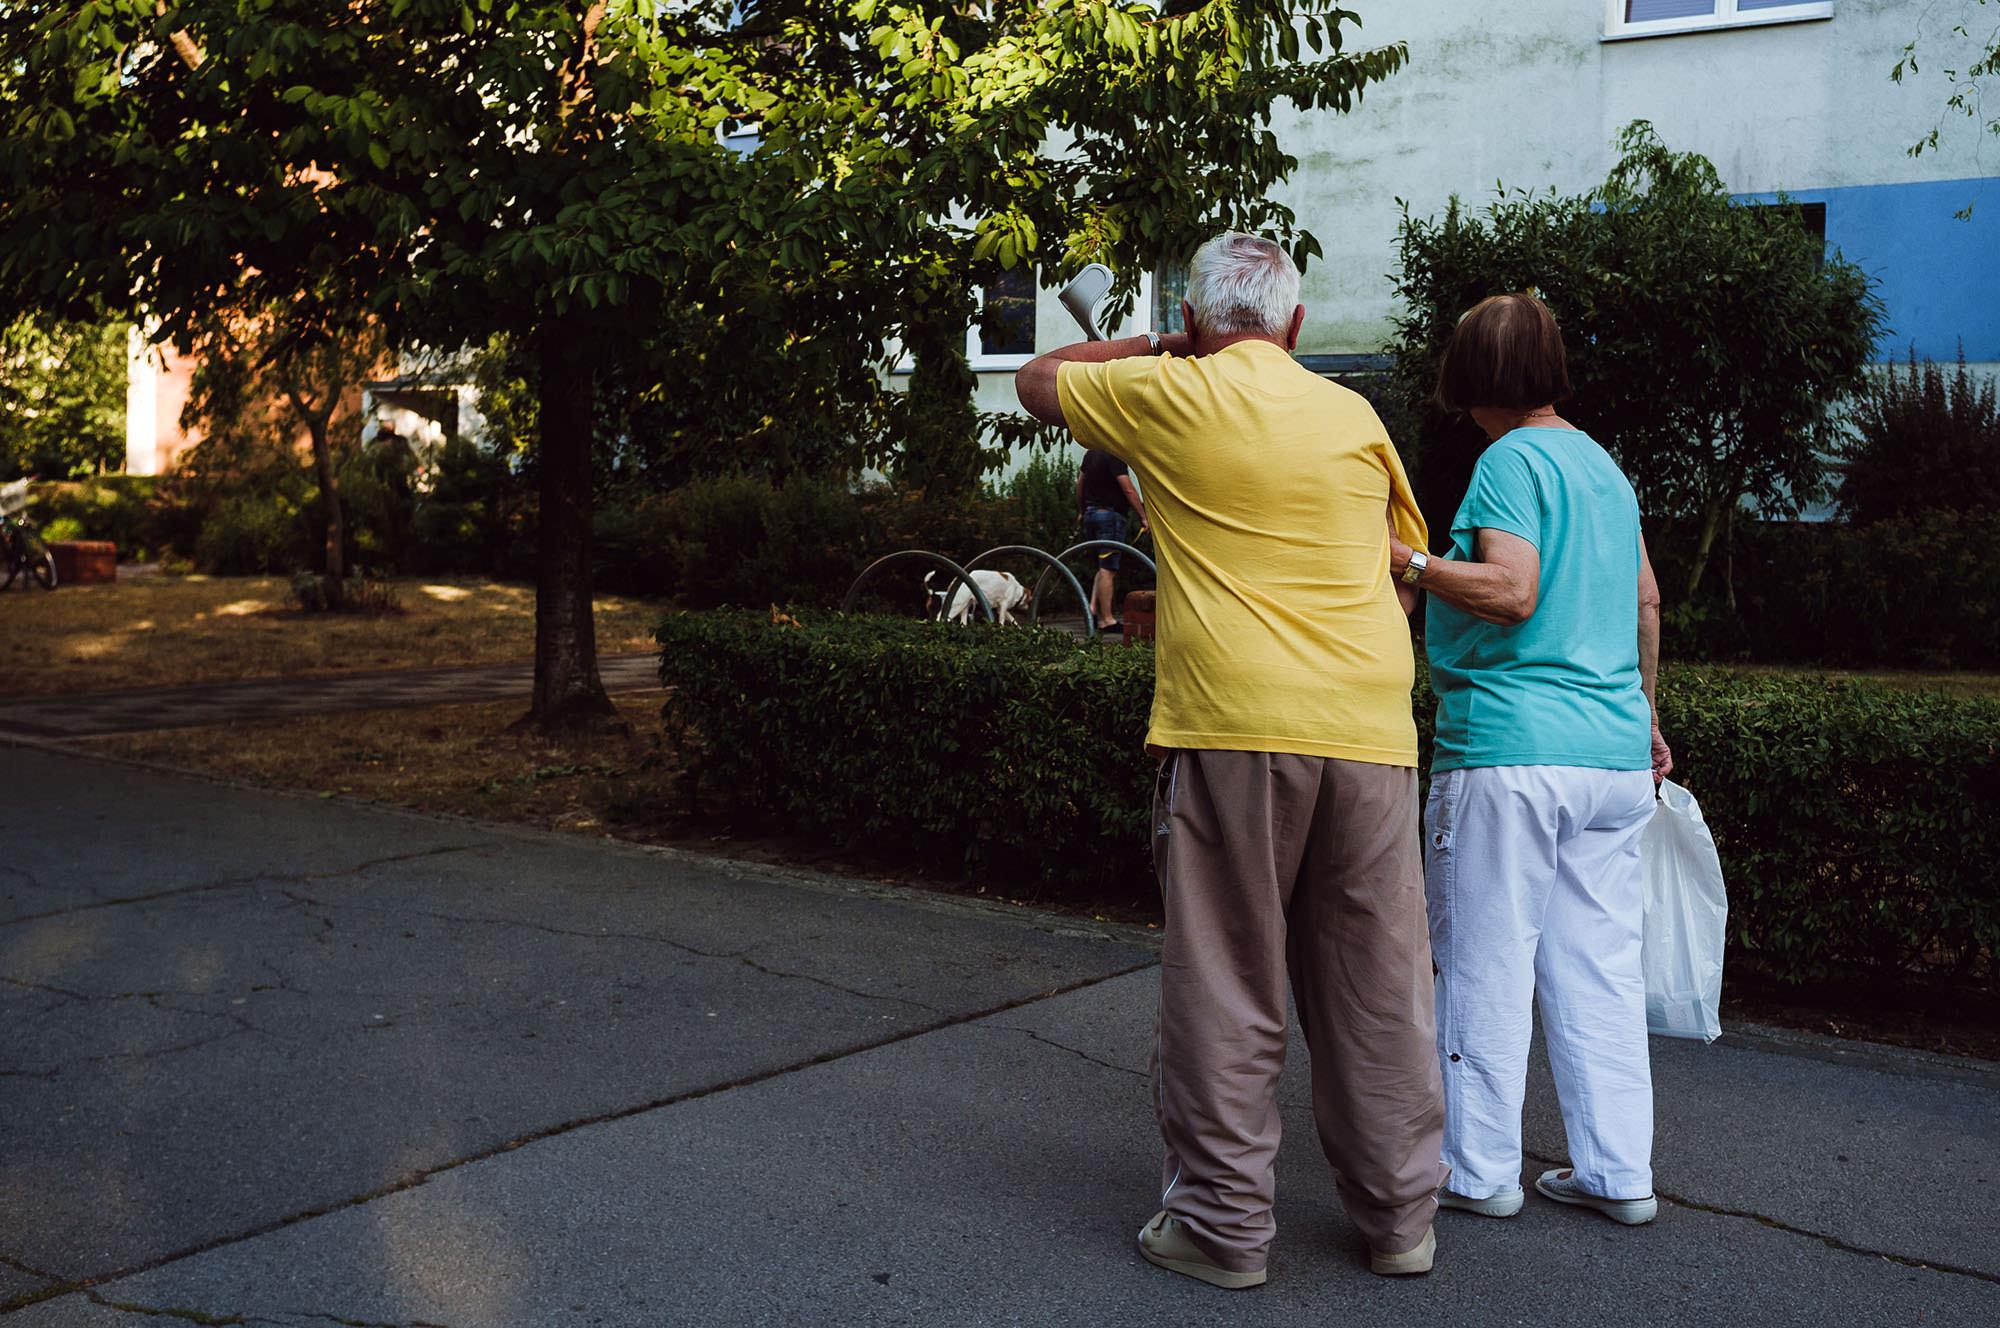 street photography leipzig old couple